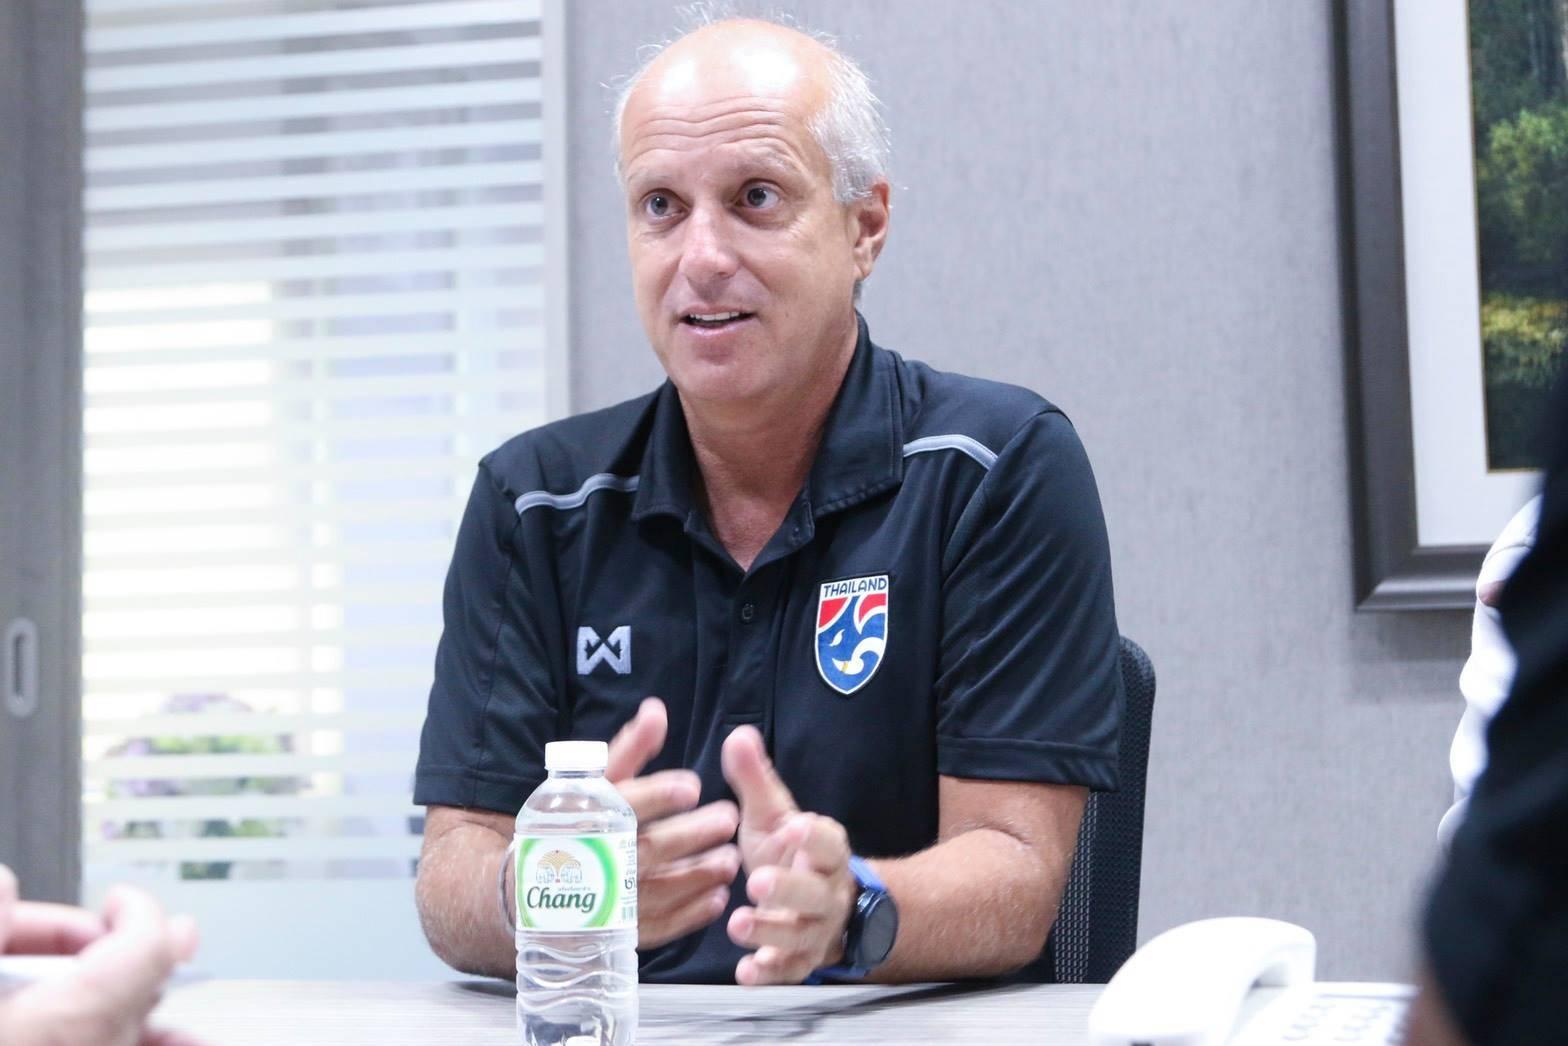 TRIBE TALK: Alexandre Gama, Thailand U23 National Team Head Coach